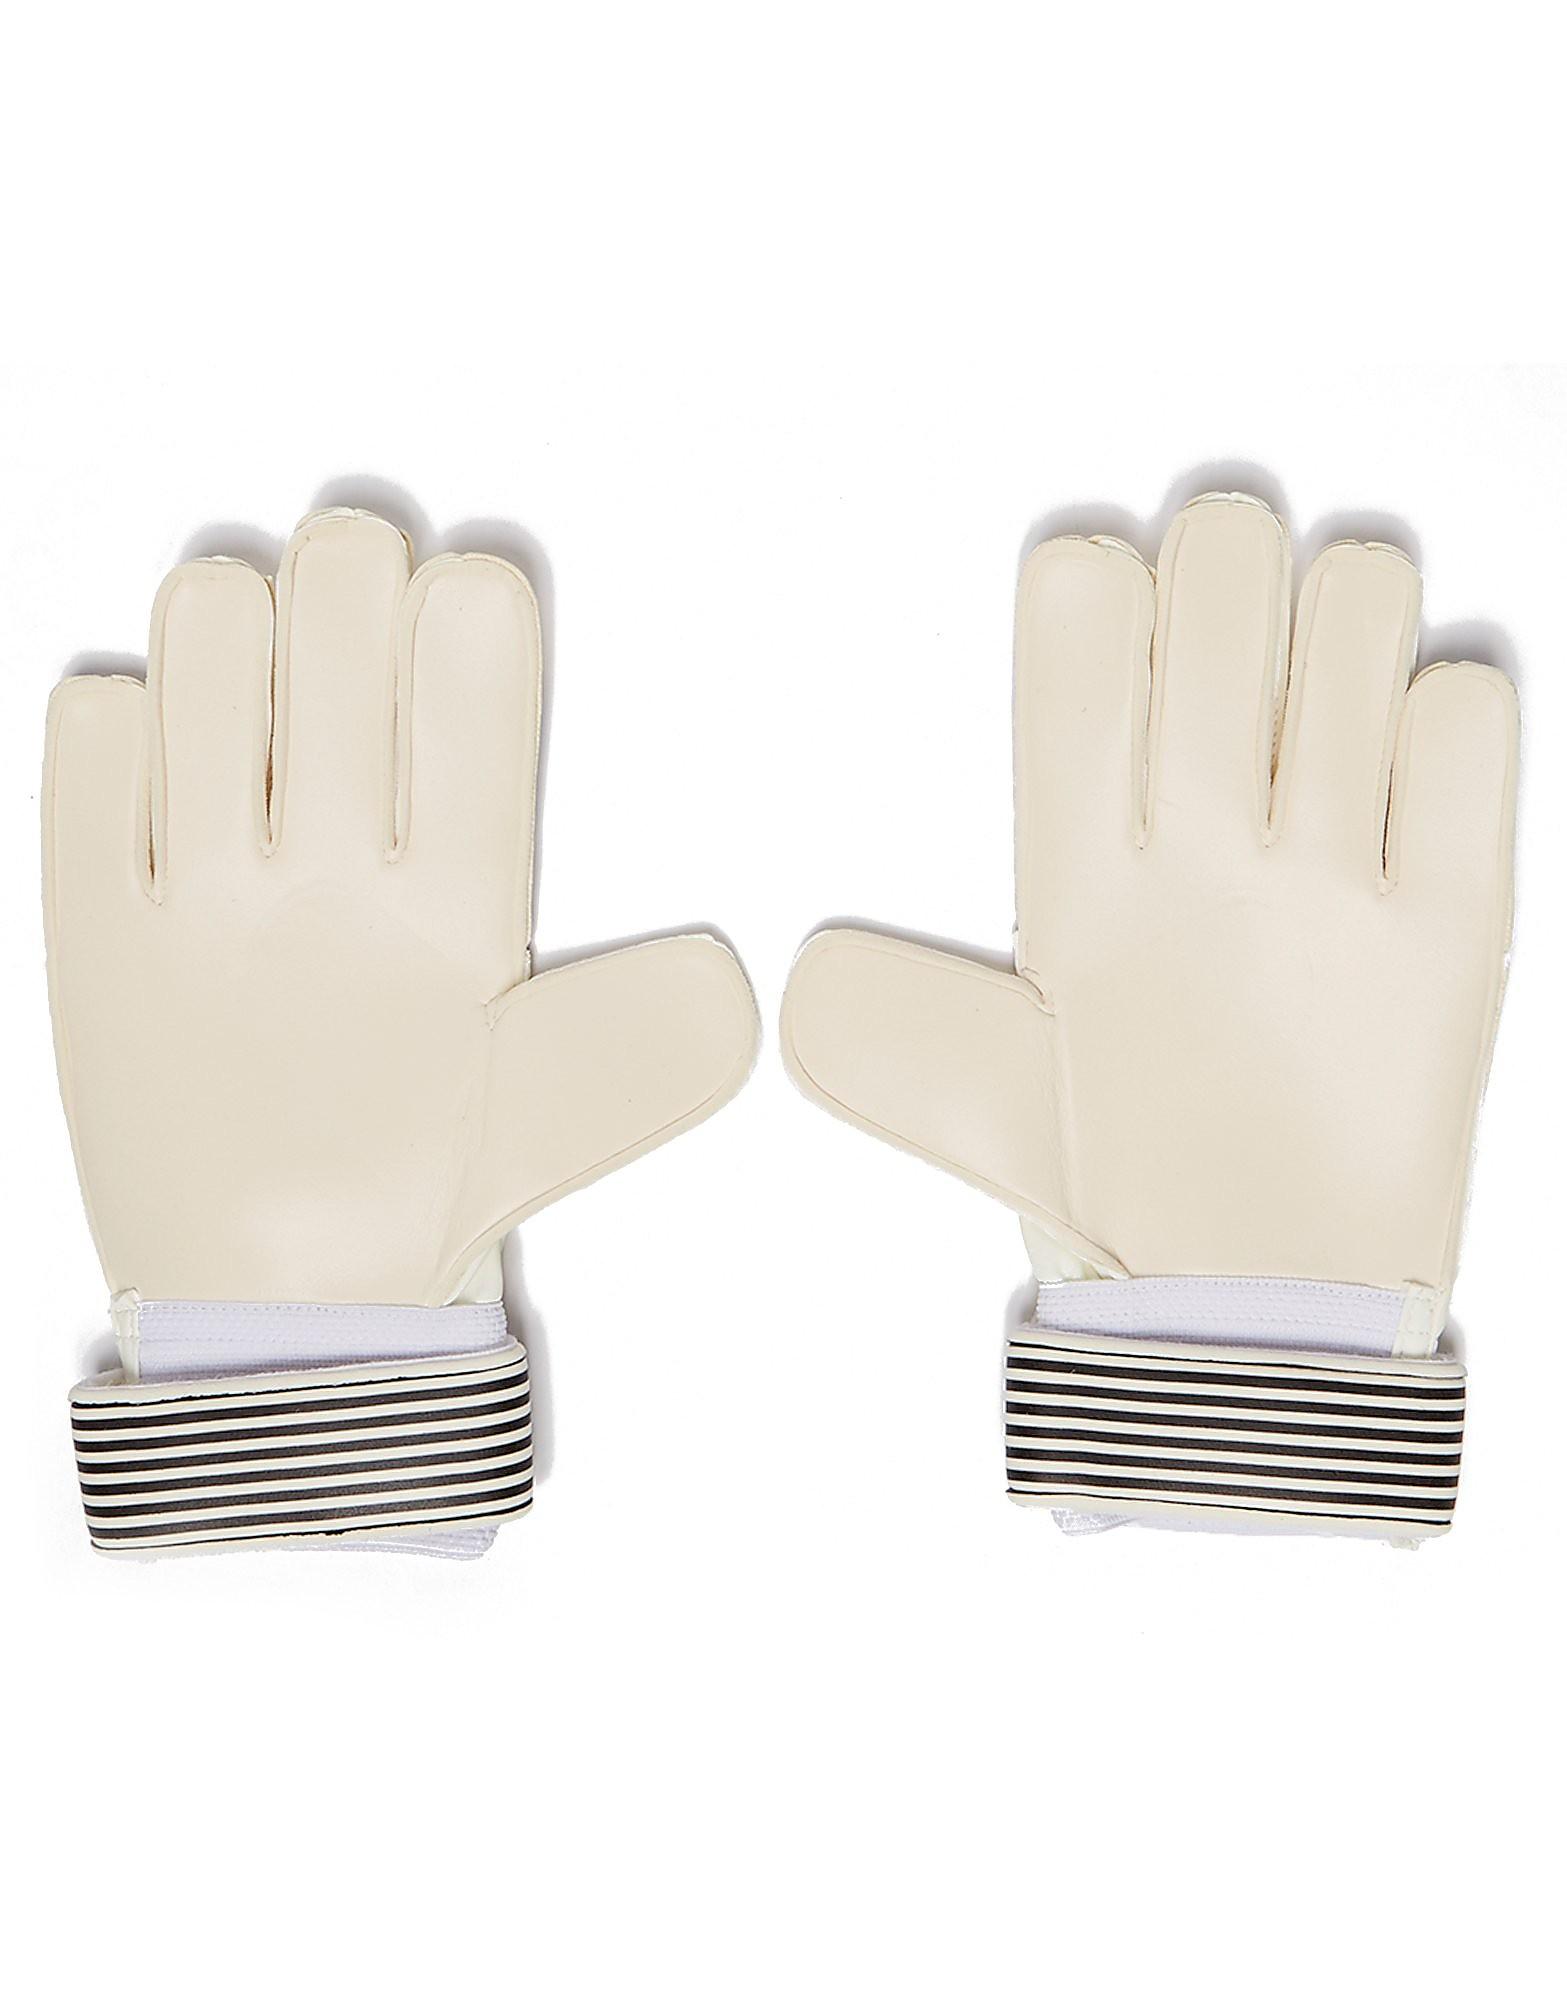 adidas Ace Goalkeeper Gloves